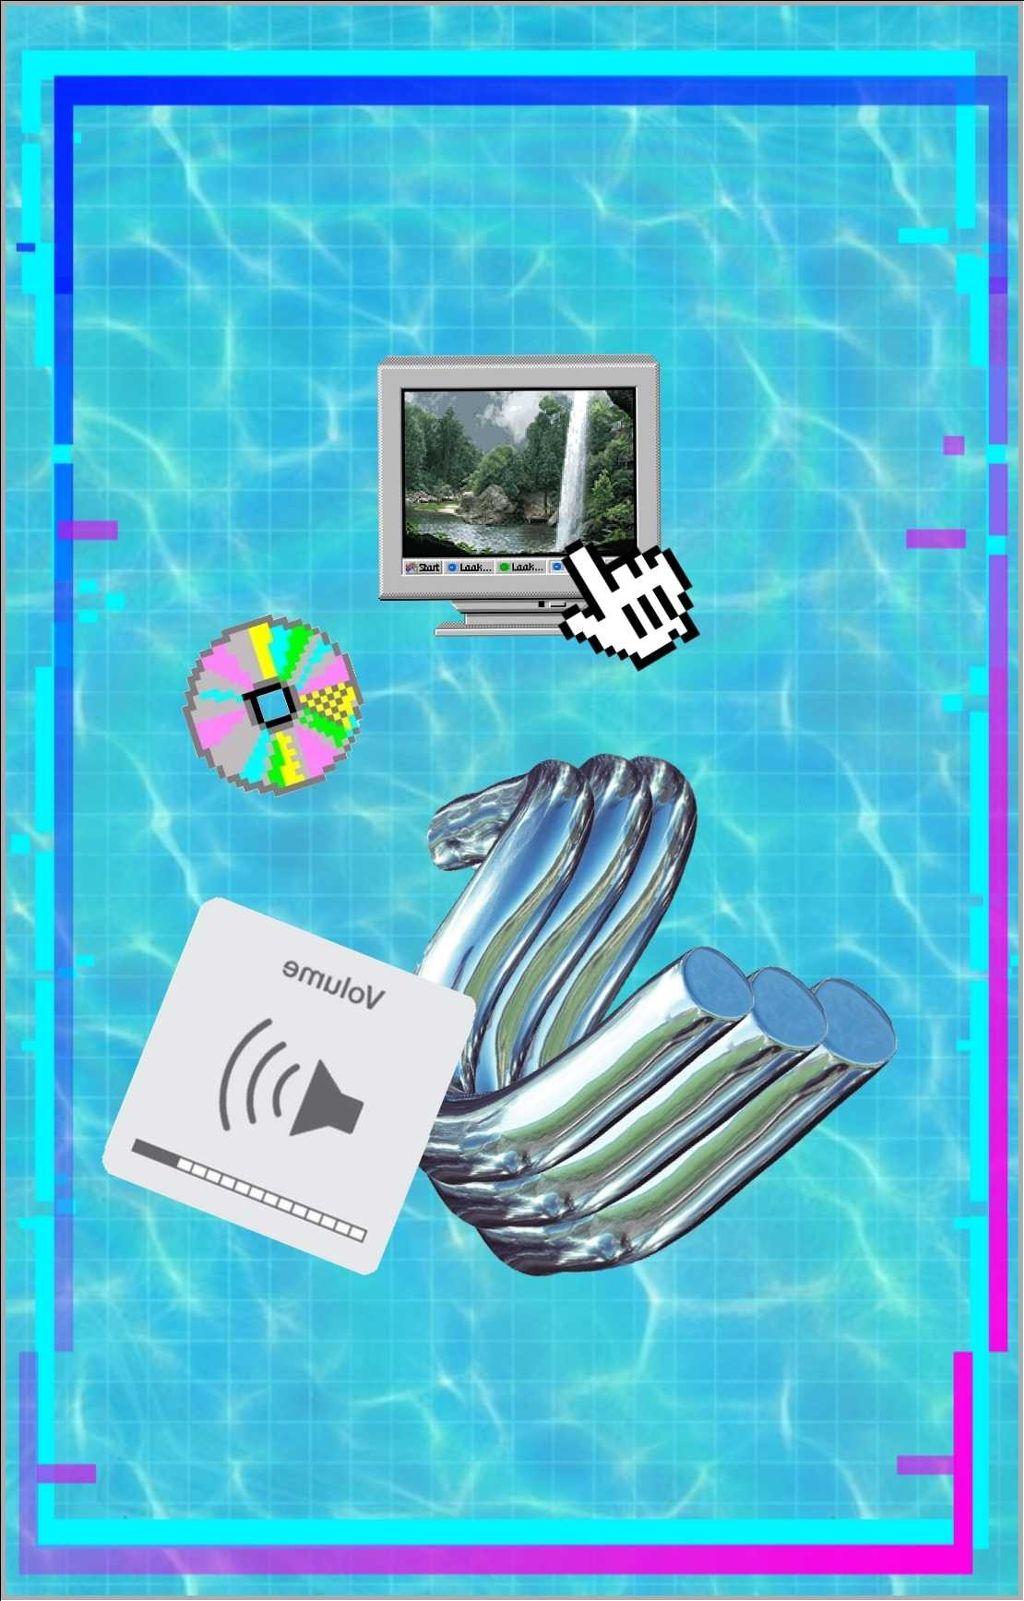 905492a745660  freetoedit  vaporwave  vaporwavecrew  webpunk  aesthetic  windows98   windows95  sadboys